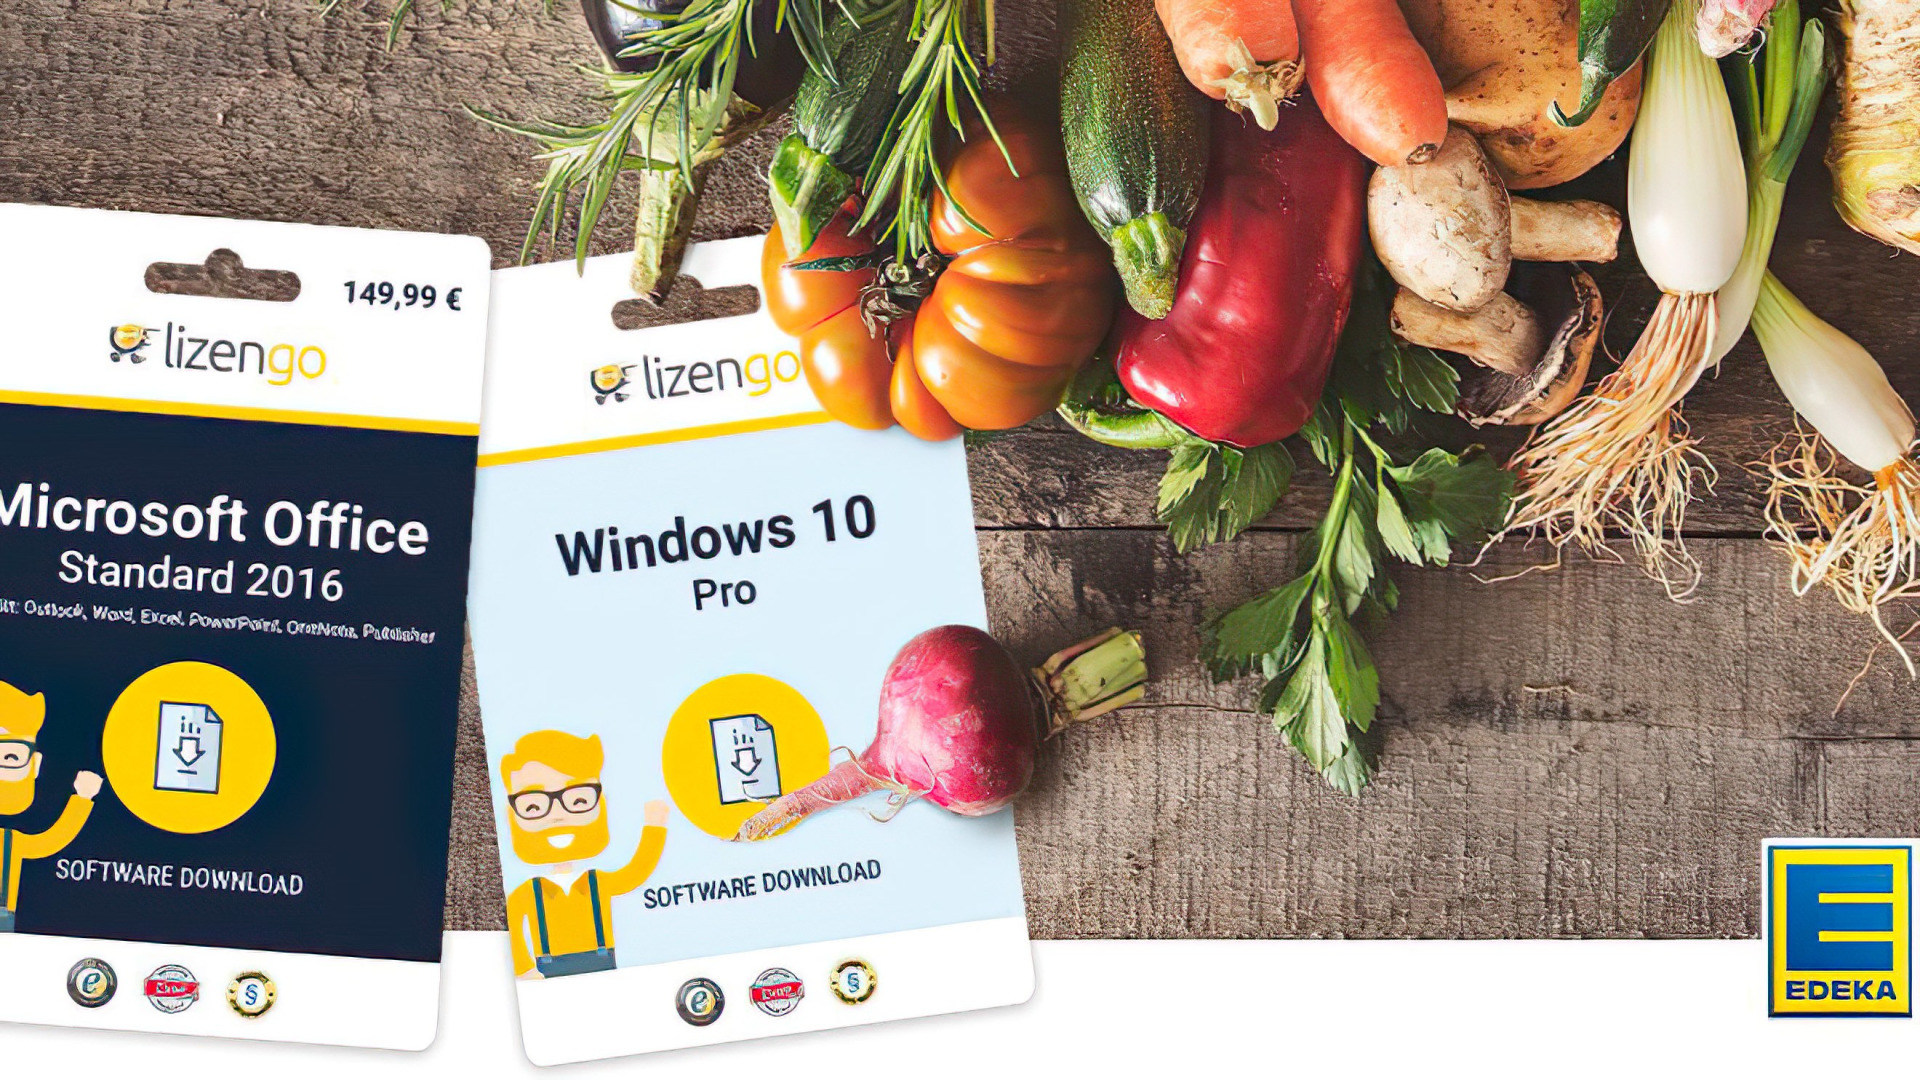 Billige Microsoft-Lizenzen: Deutsche Product-Key-Dealer verschwunden - WinFuture